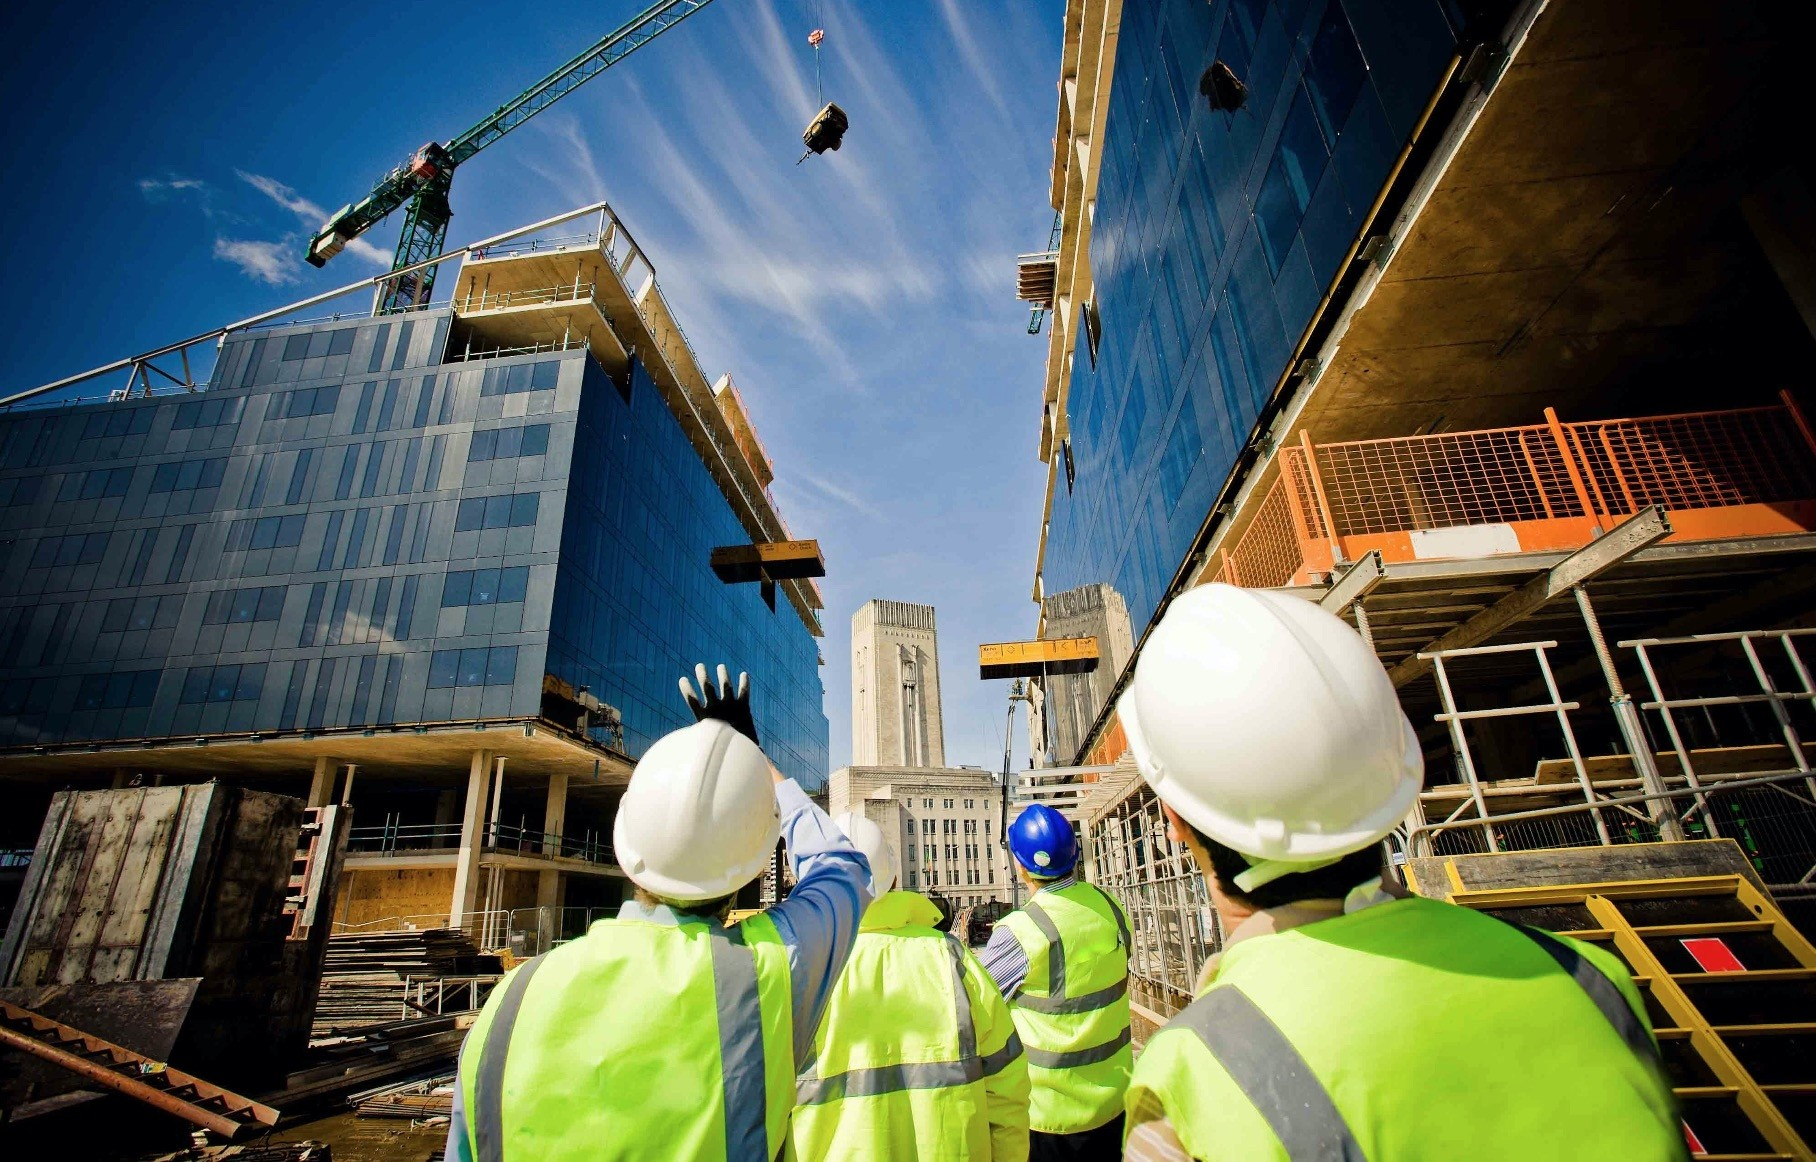 Turkish contractors undertook overseas projects worth around $19.4 billion last year, a 28.2 percent increase year-on-year.